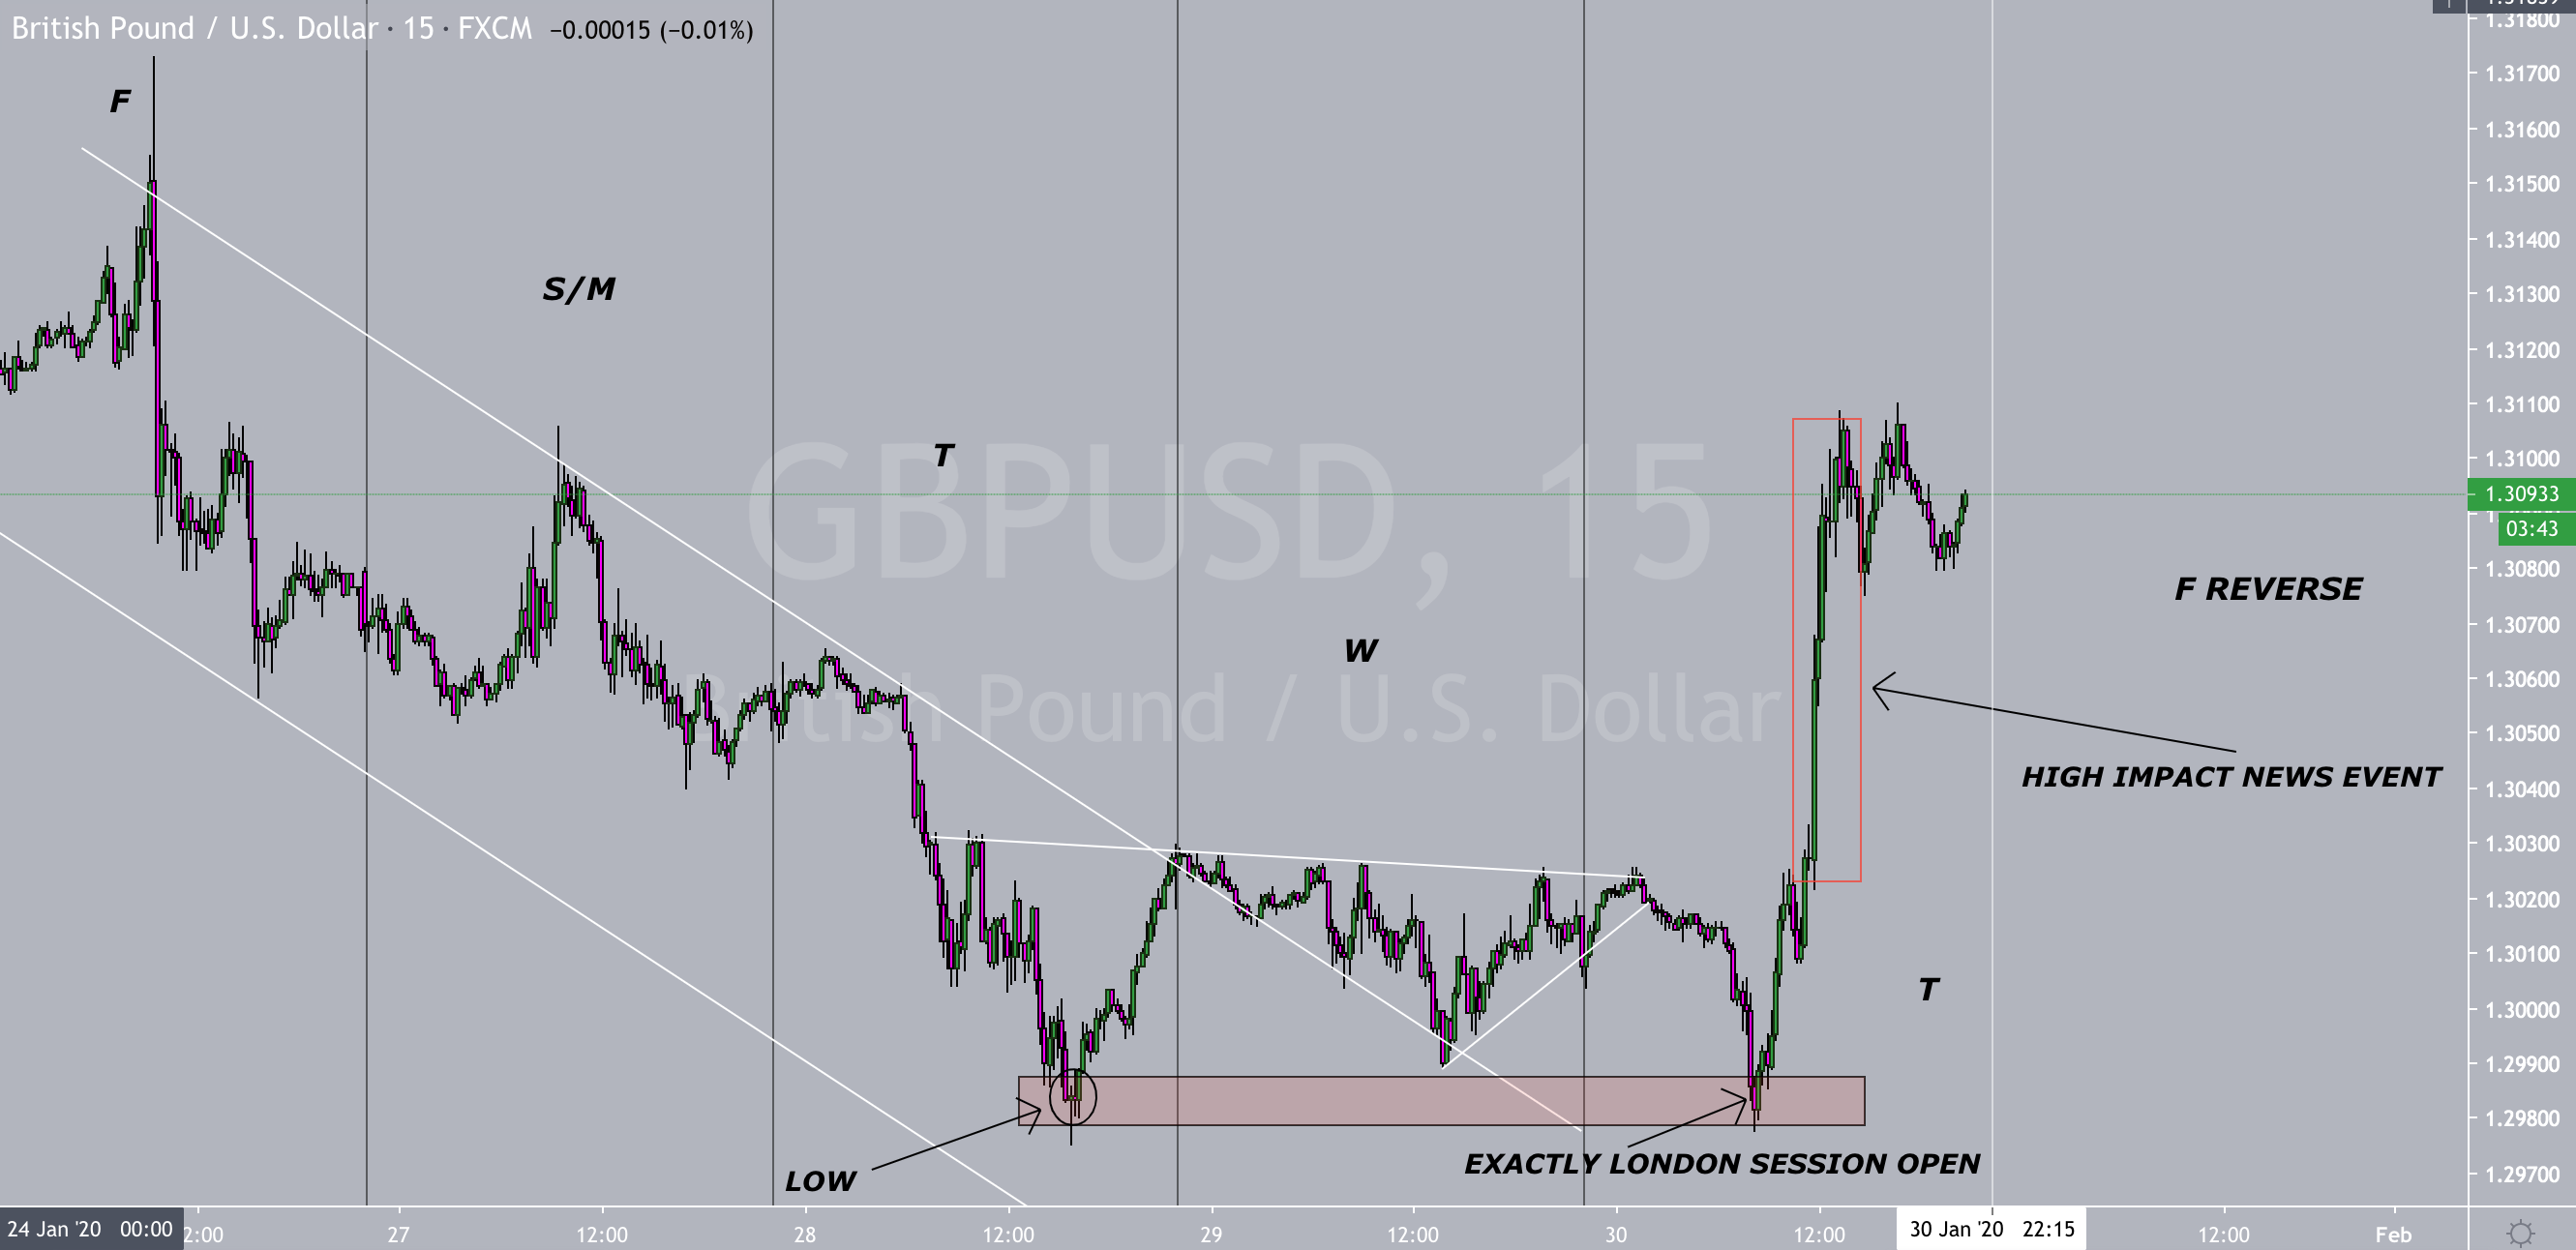 High Impact GBP News Manipulation + SignatureTrade